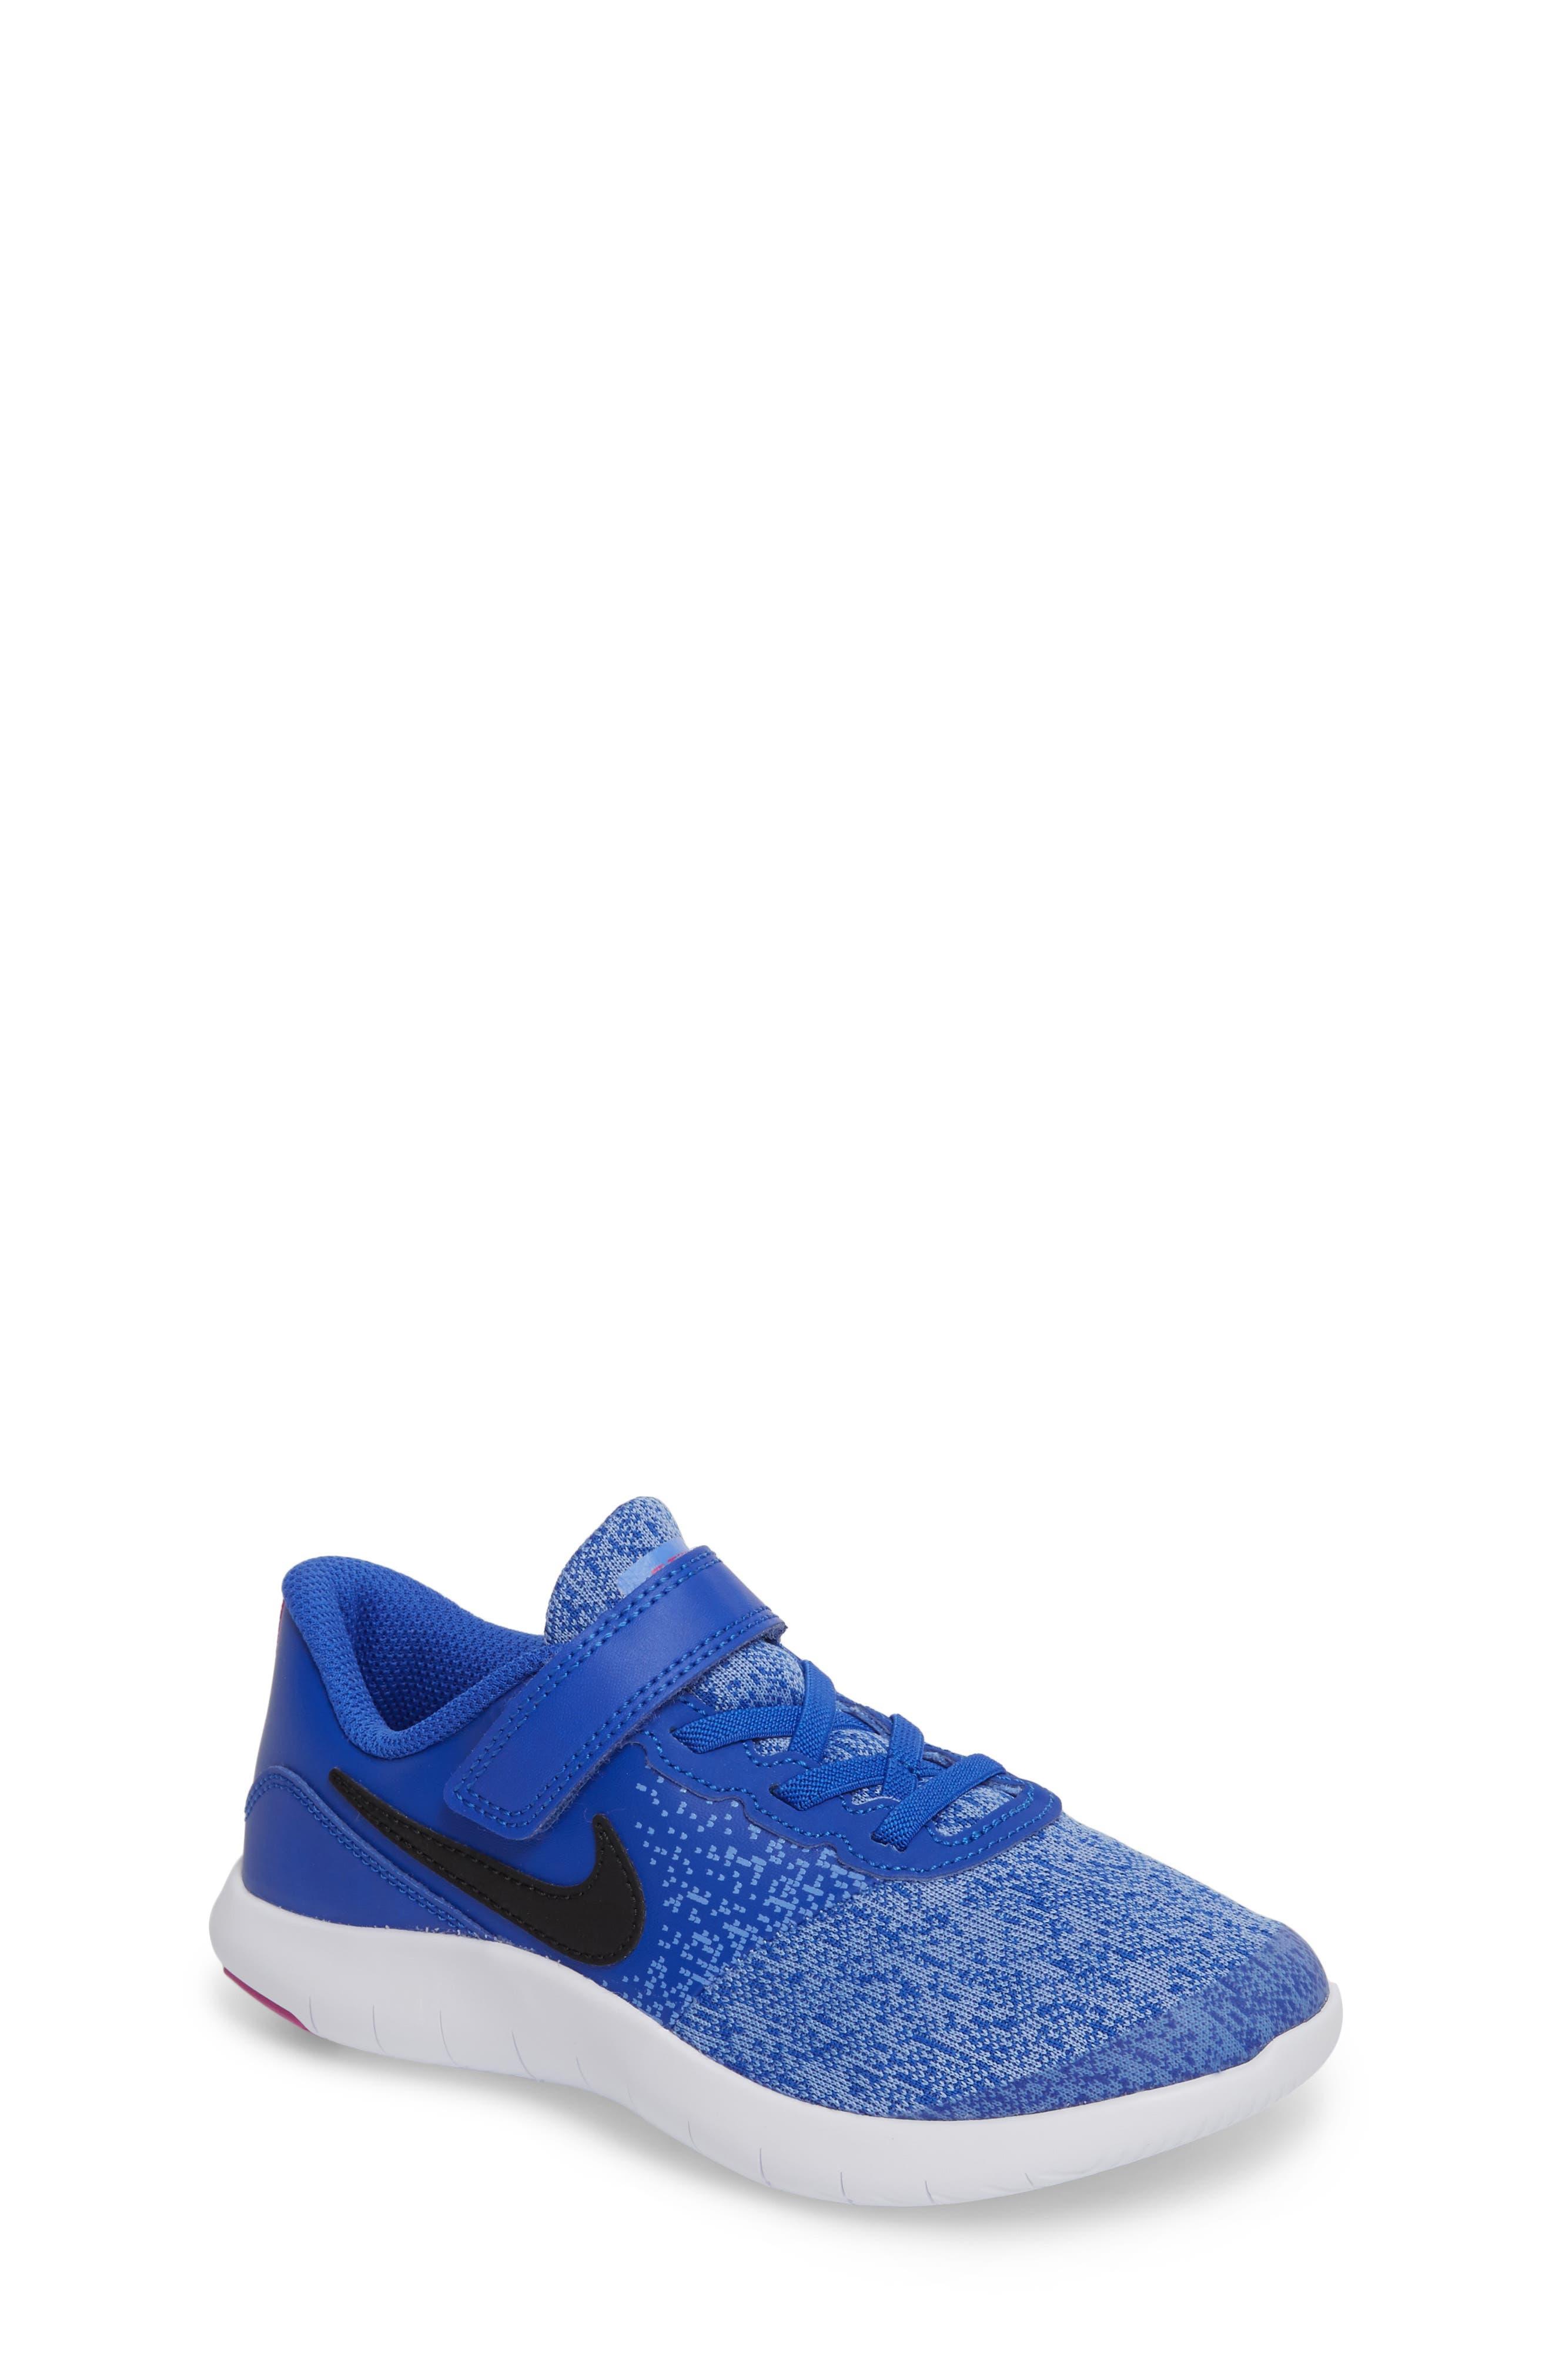 Alternate Image 1 Selected - Nike Flex Contact Running Shoe (Baby, Walker, Toddler & Little Kid)